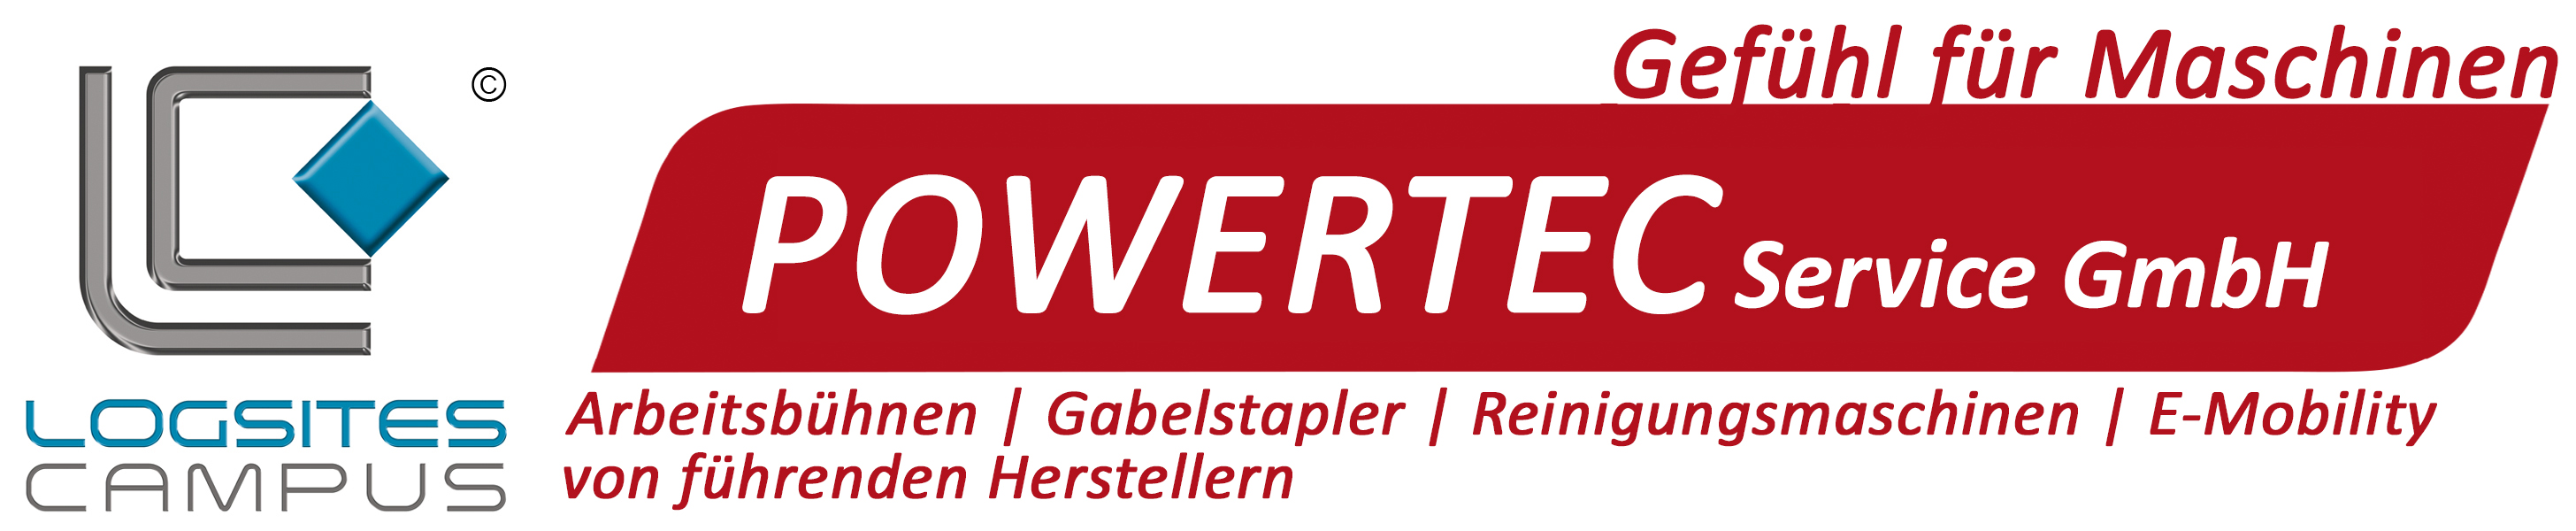 Powertec Service GmbH Online Shop-Logo